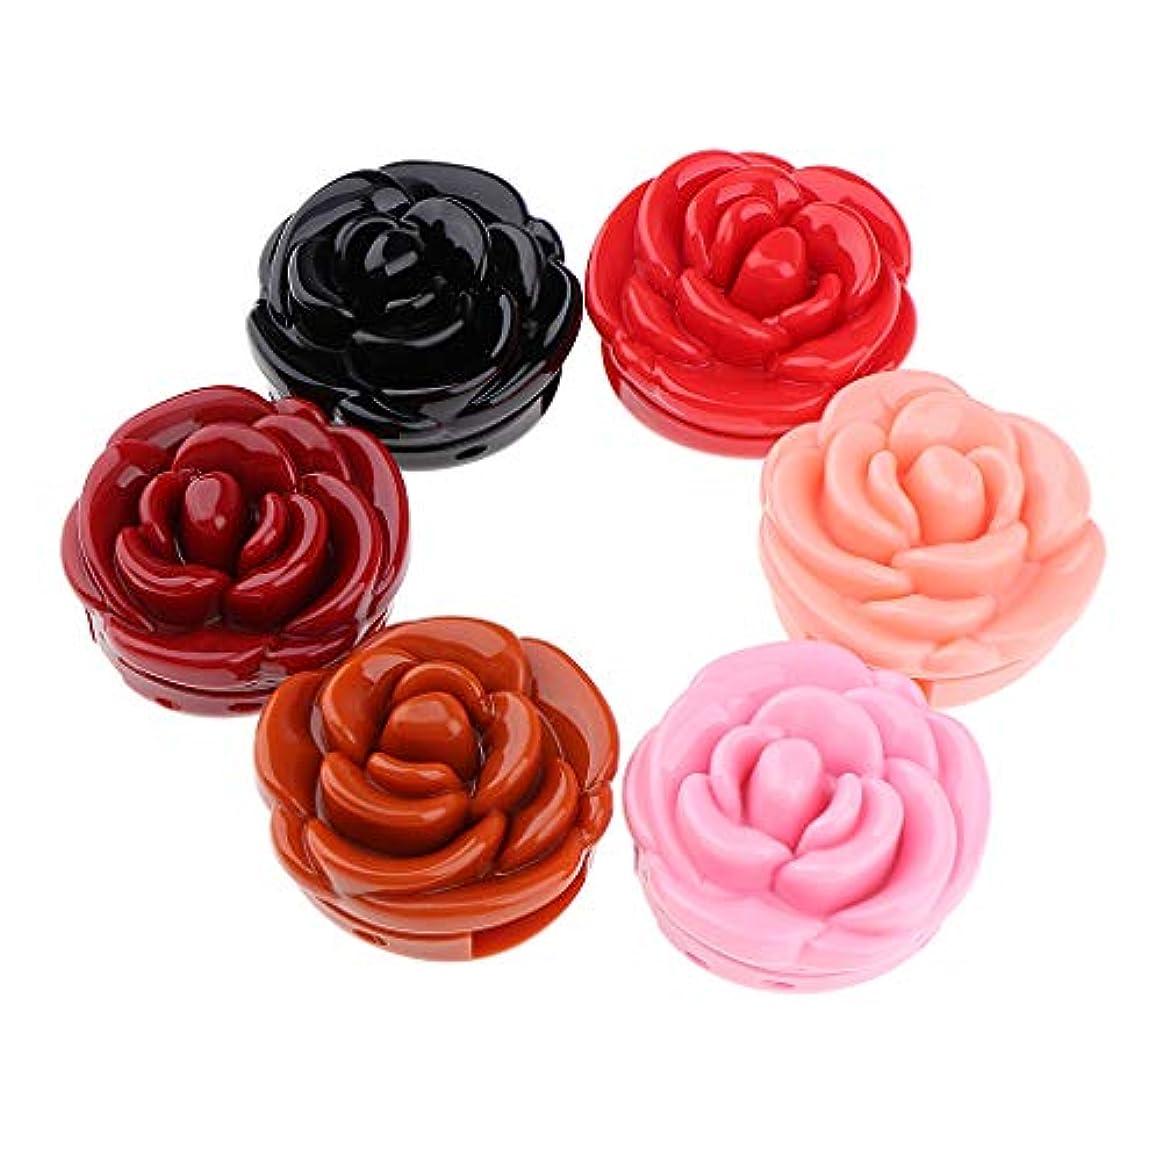 Sharplace 防水口紅 リップクリーム 美容 化粧品 メイクアップツール 6色セット